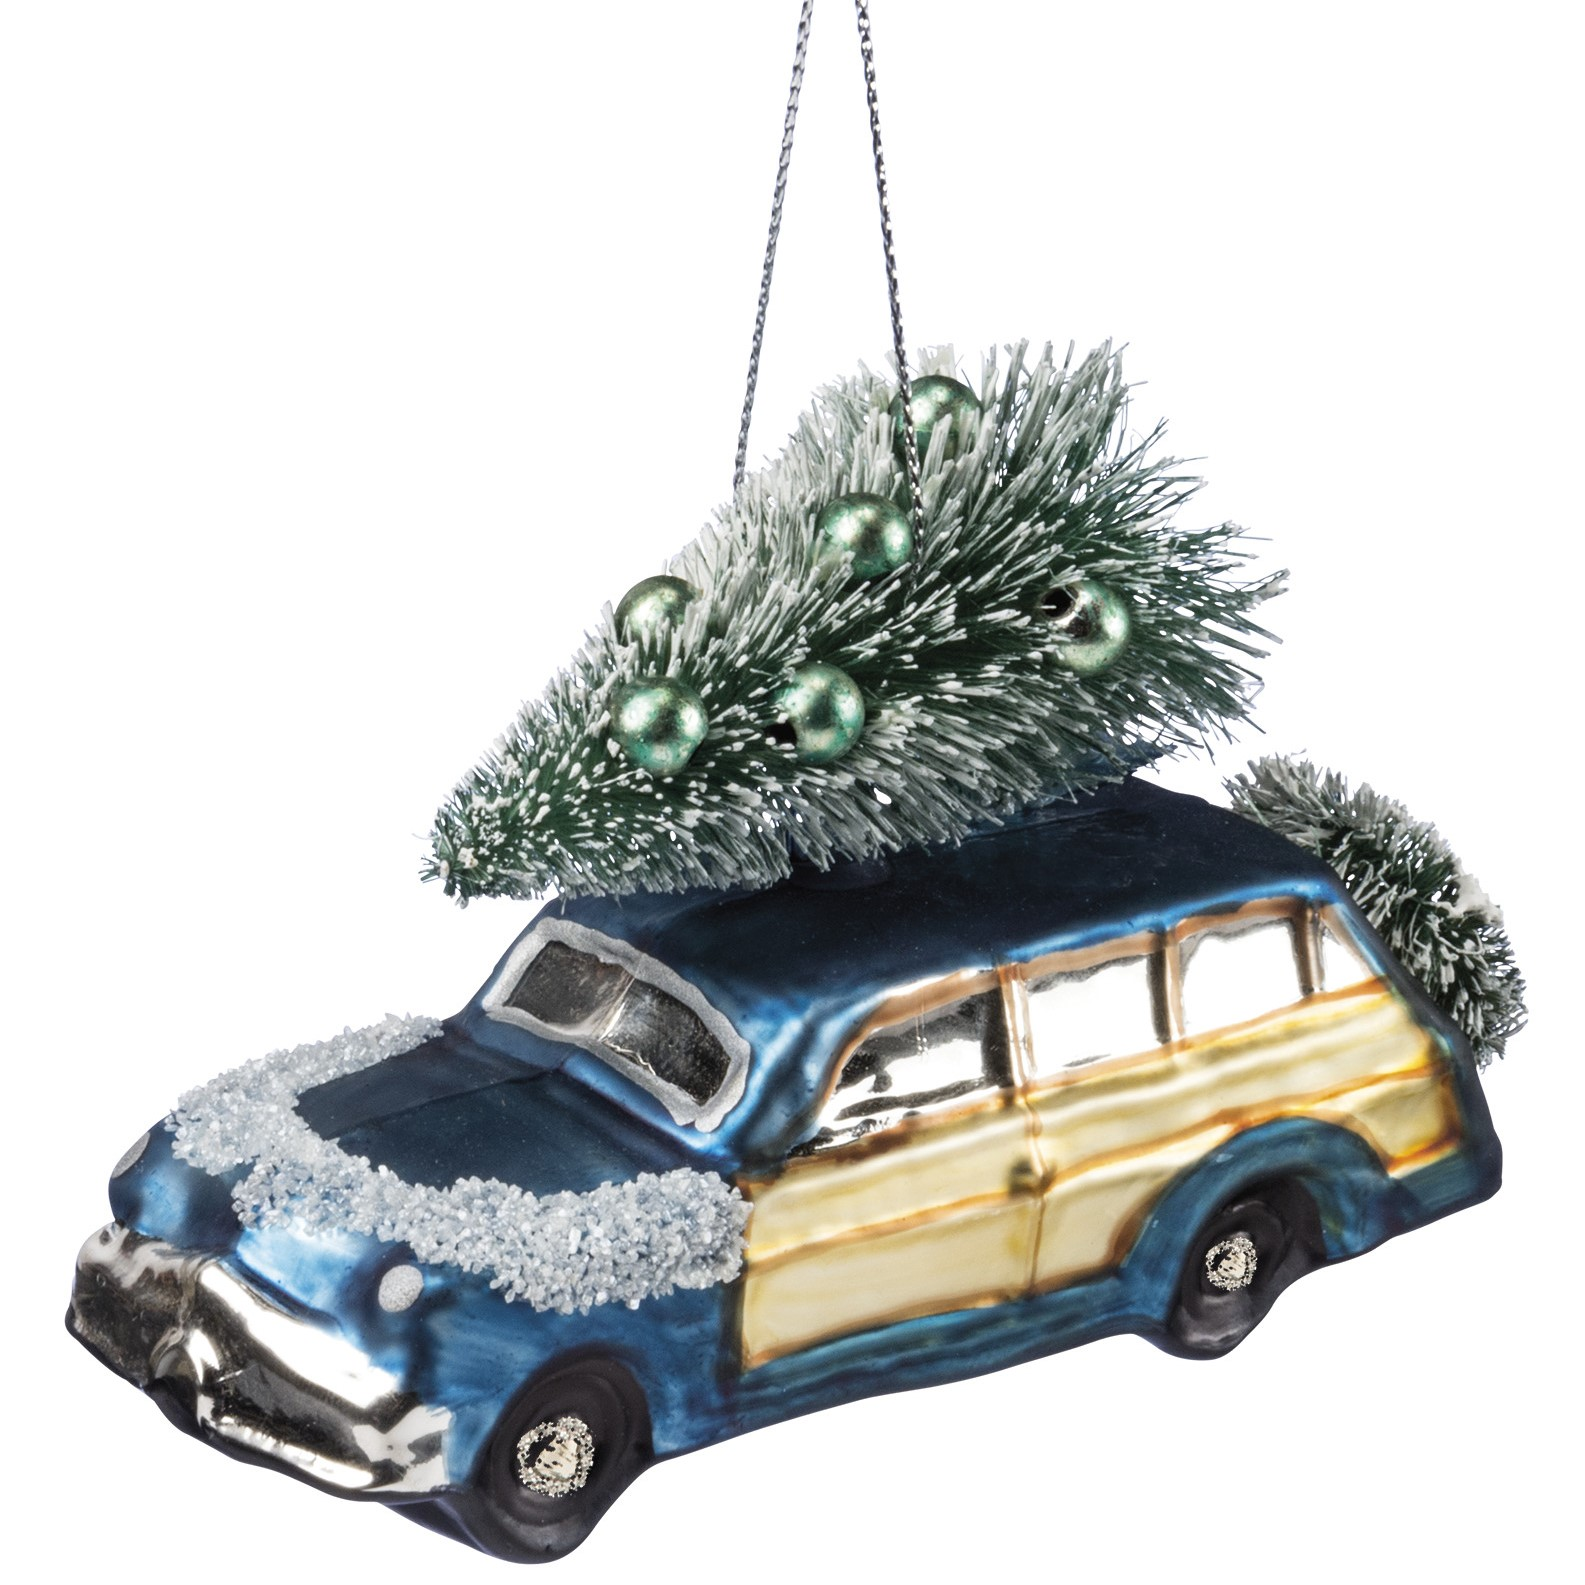 Blue Car Wagoneer Glass Christmas Tree Ornament Salty Home